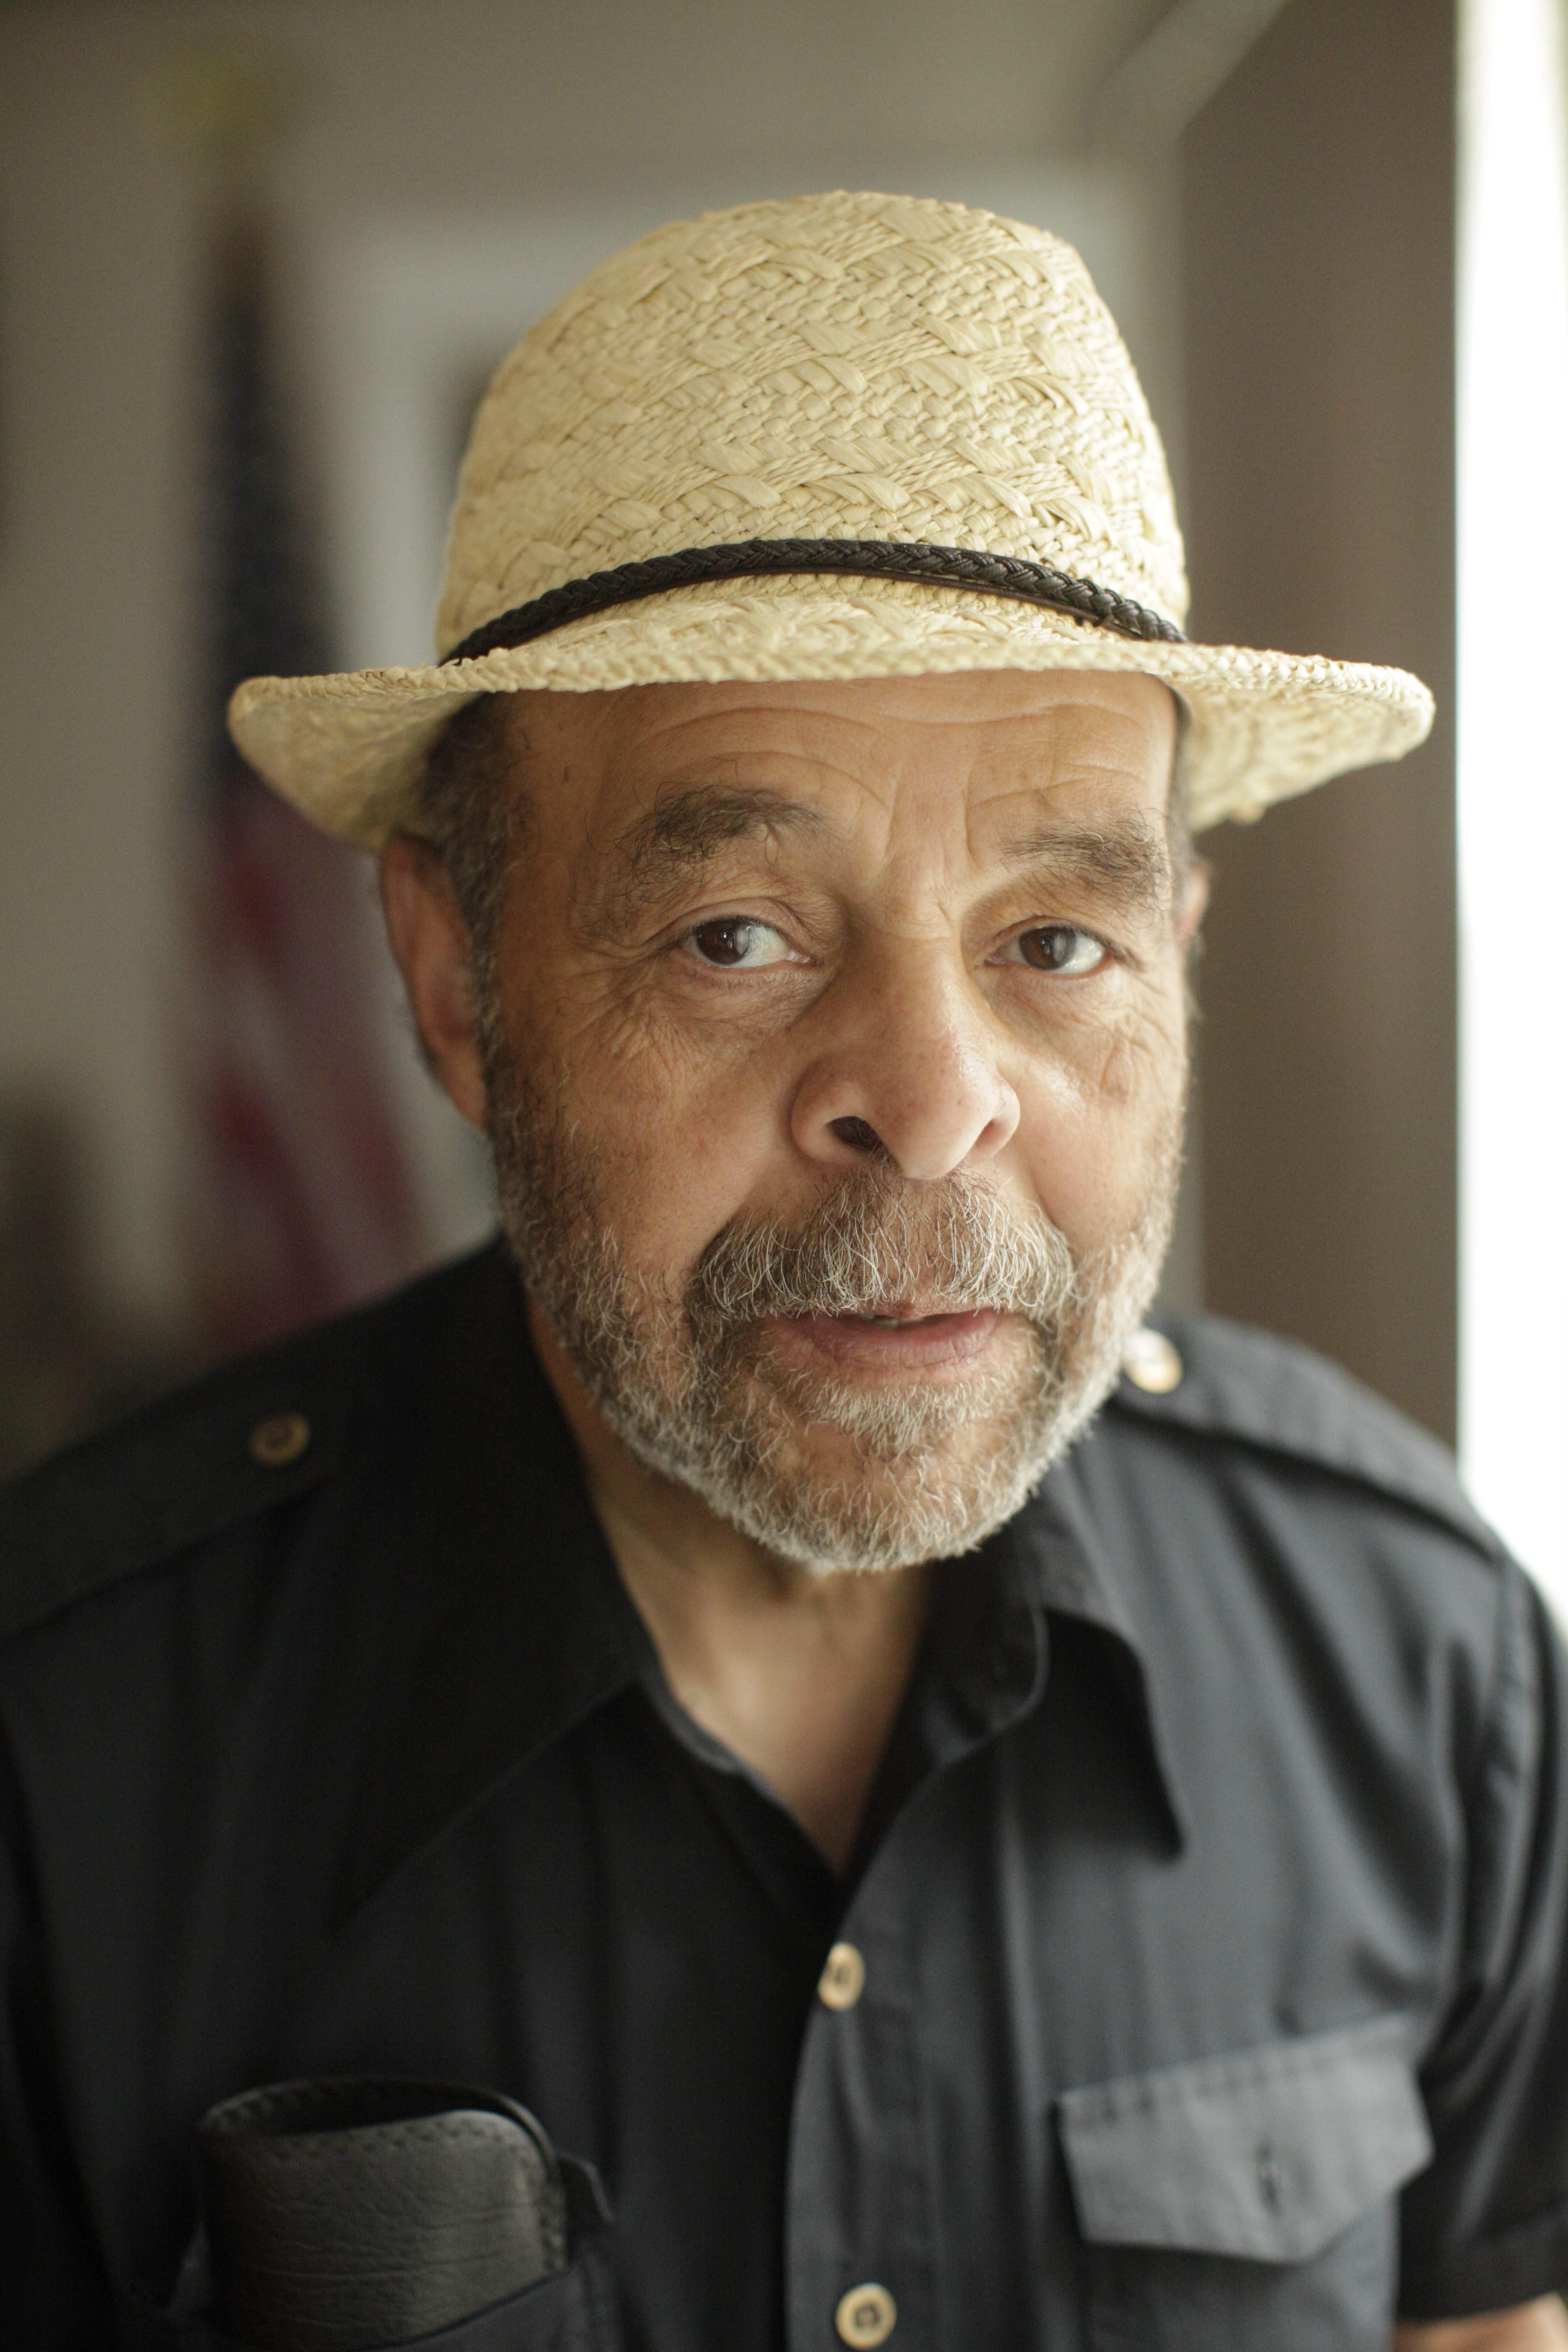 Richard C. Cummings is dedicated to reviving the East Side.